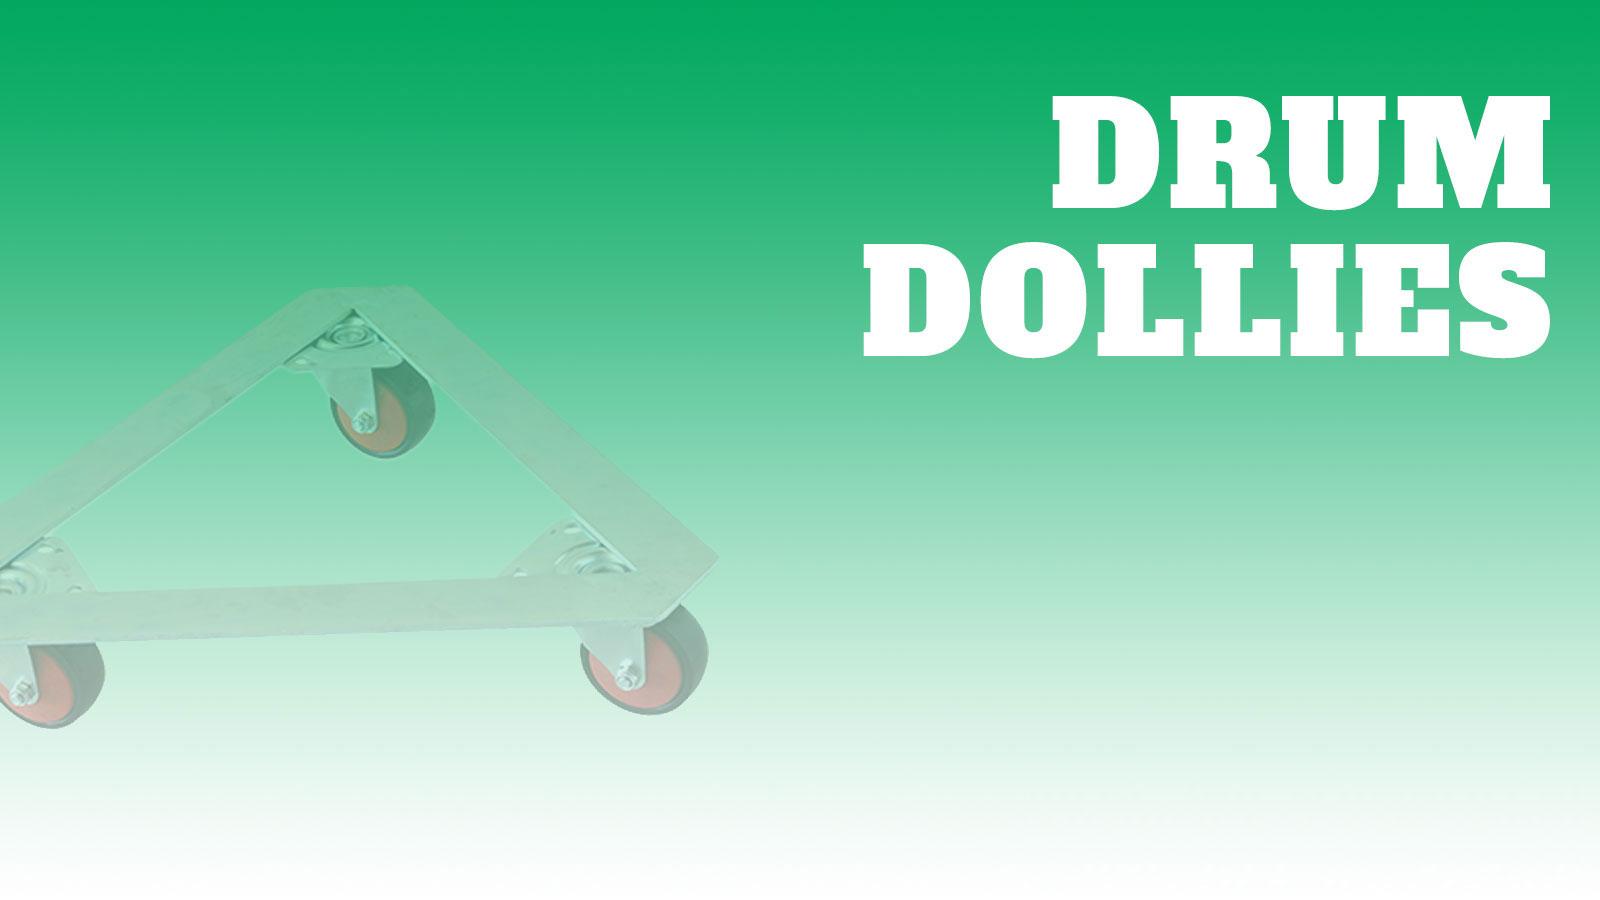 DrumHandling-Dollies